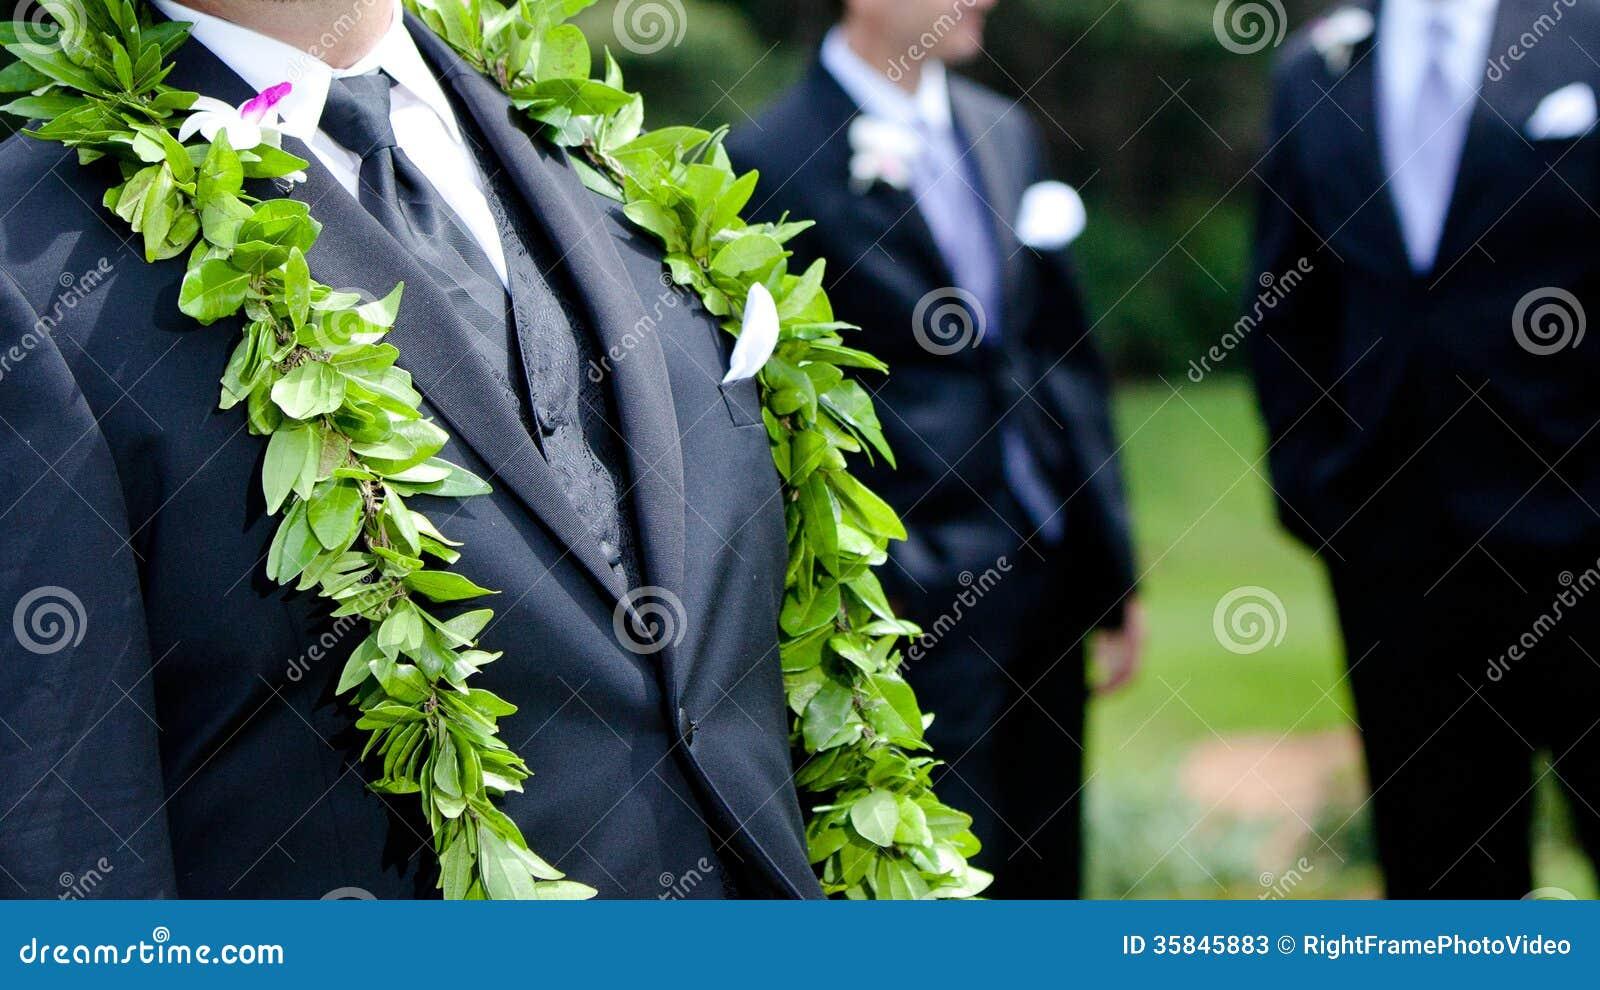 Grooms flowers hawaiian wedding stock image image of rose groom s flowers hawaiian wedding rose sprig izmirmasajfo Image collections